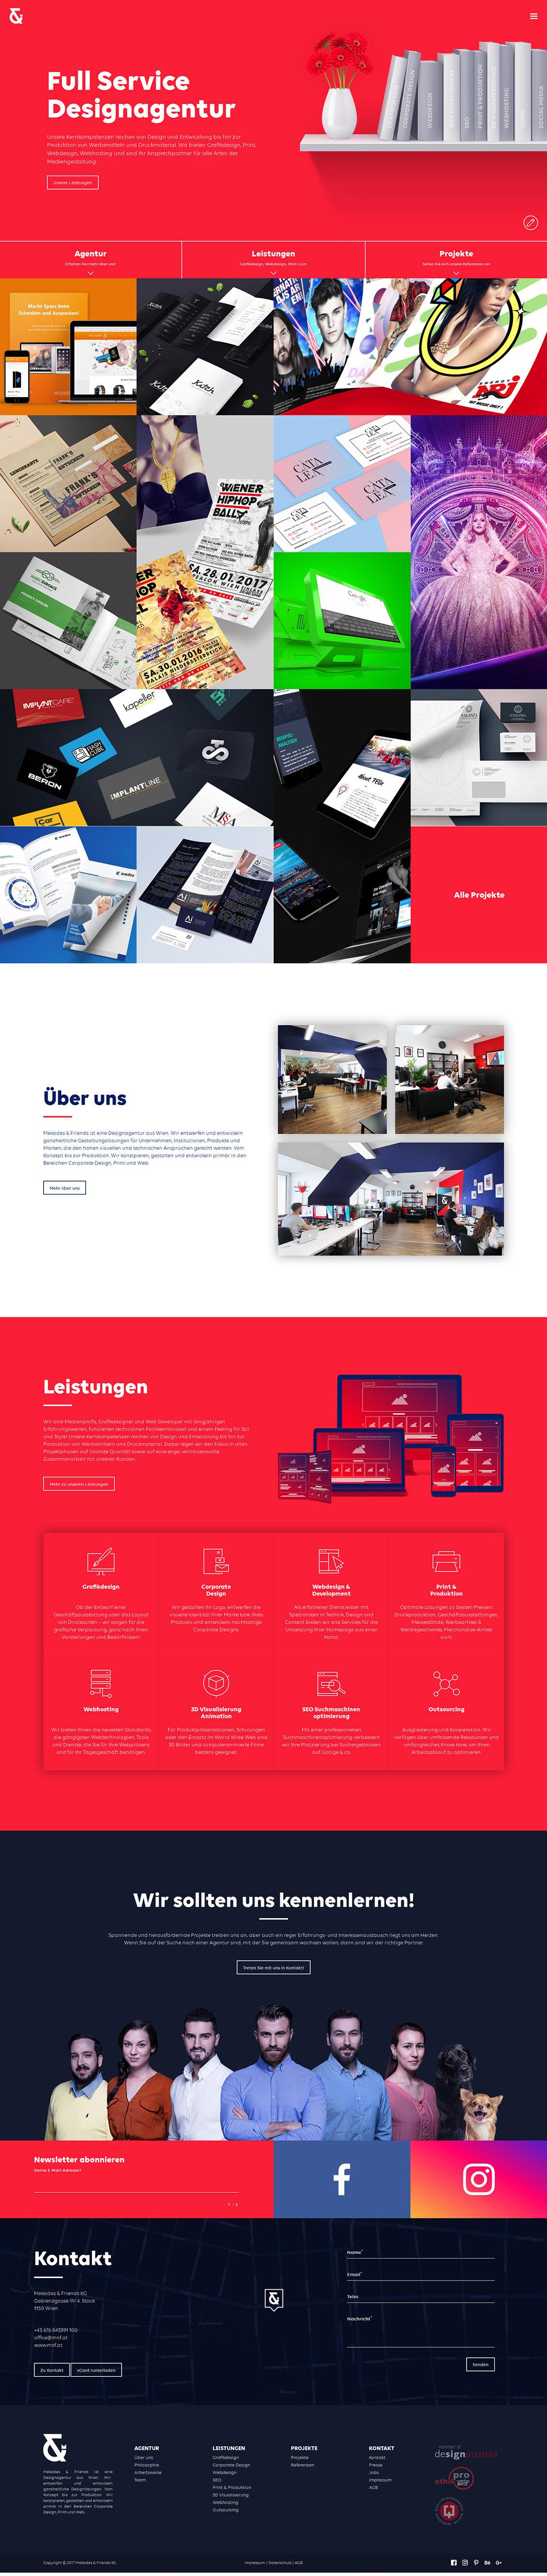 Mekades & Friends平面設計和網頁設計機構網站欣賞